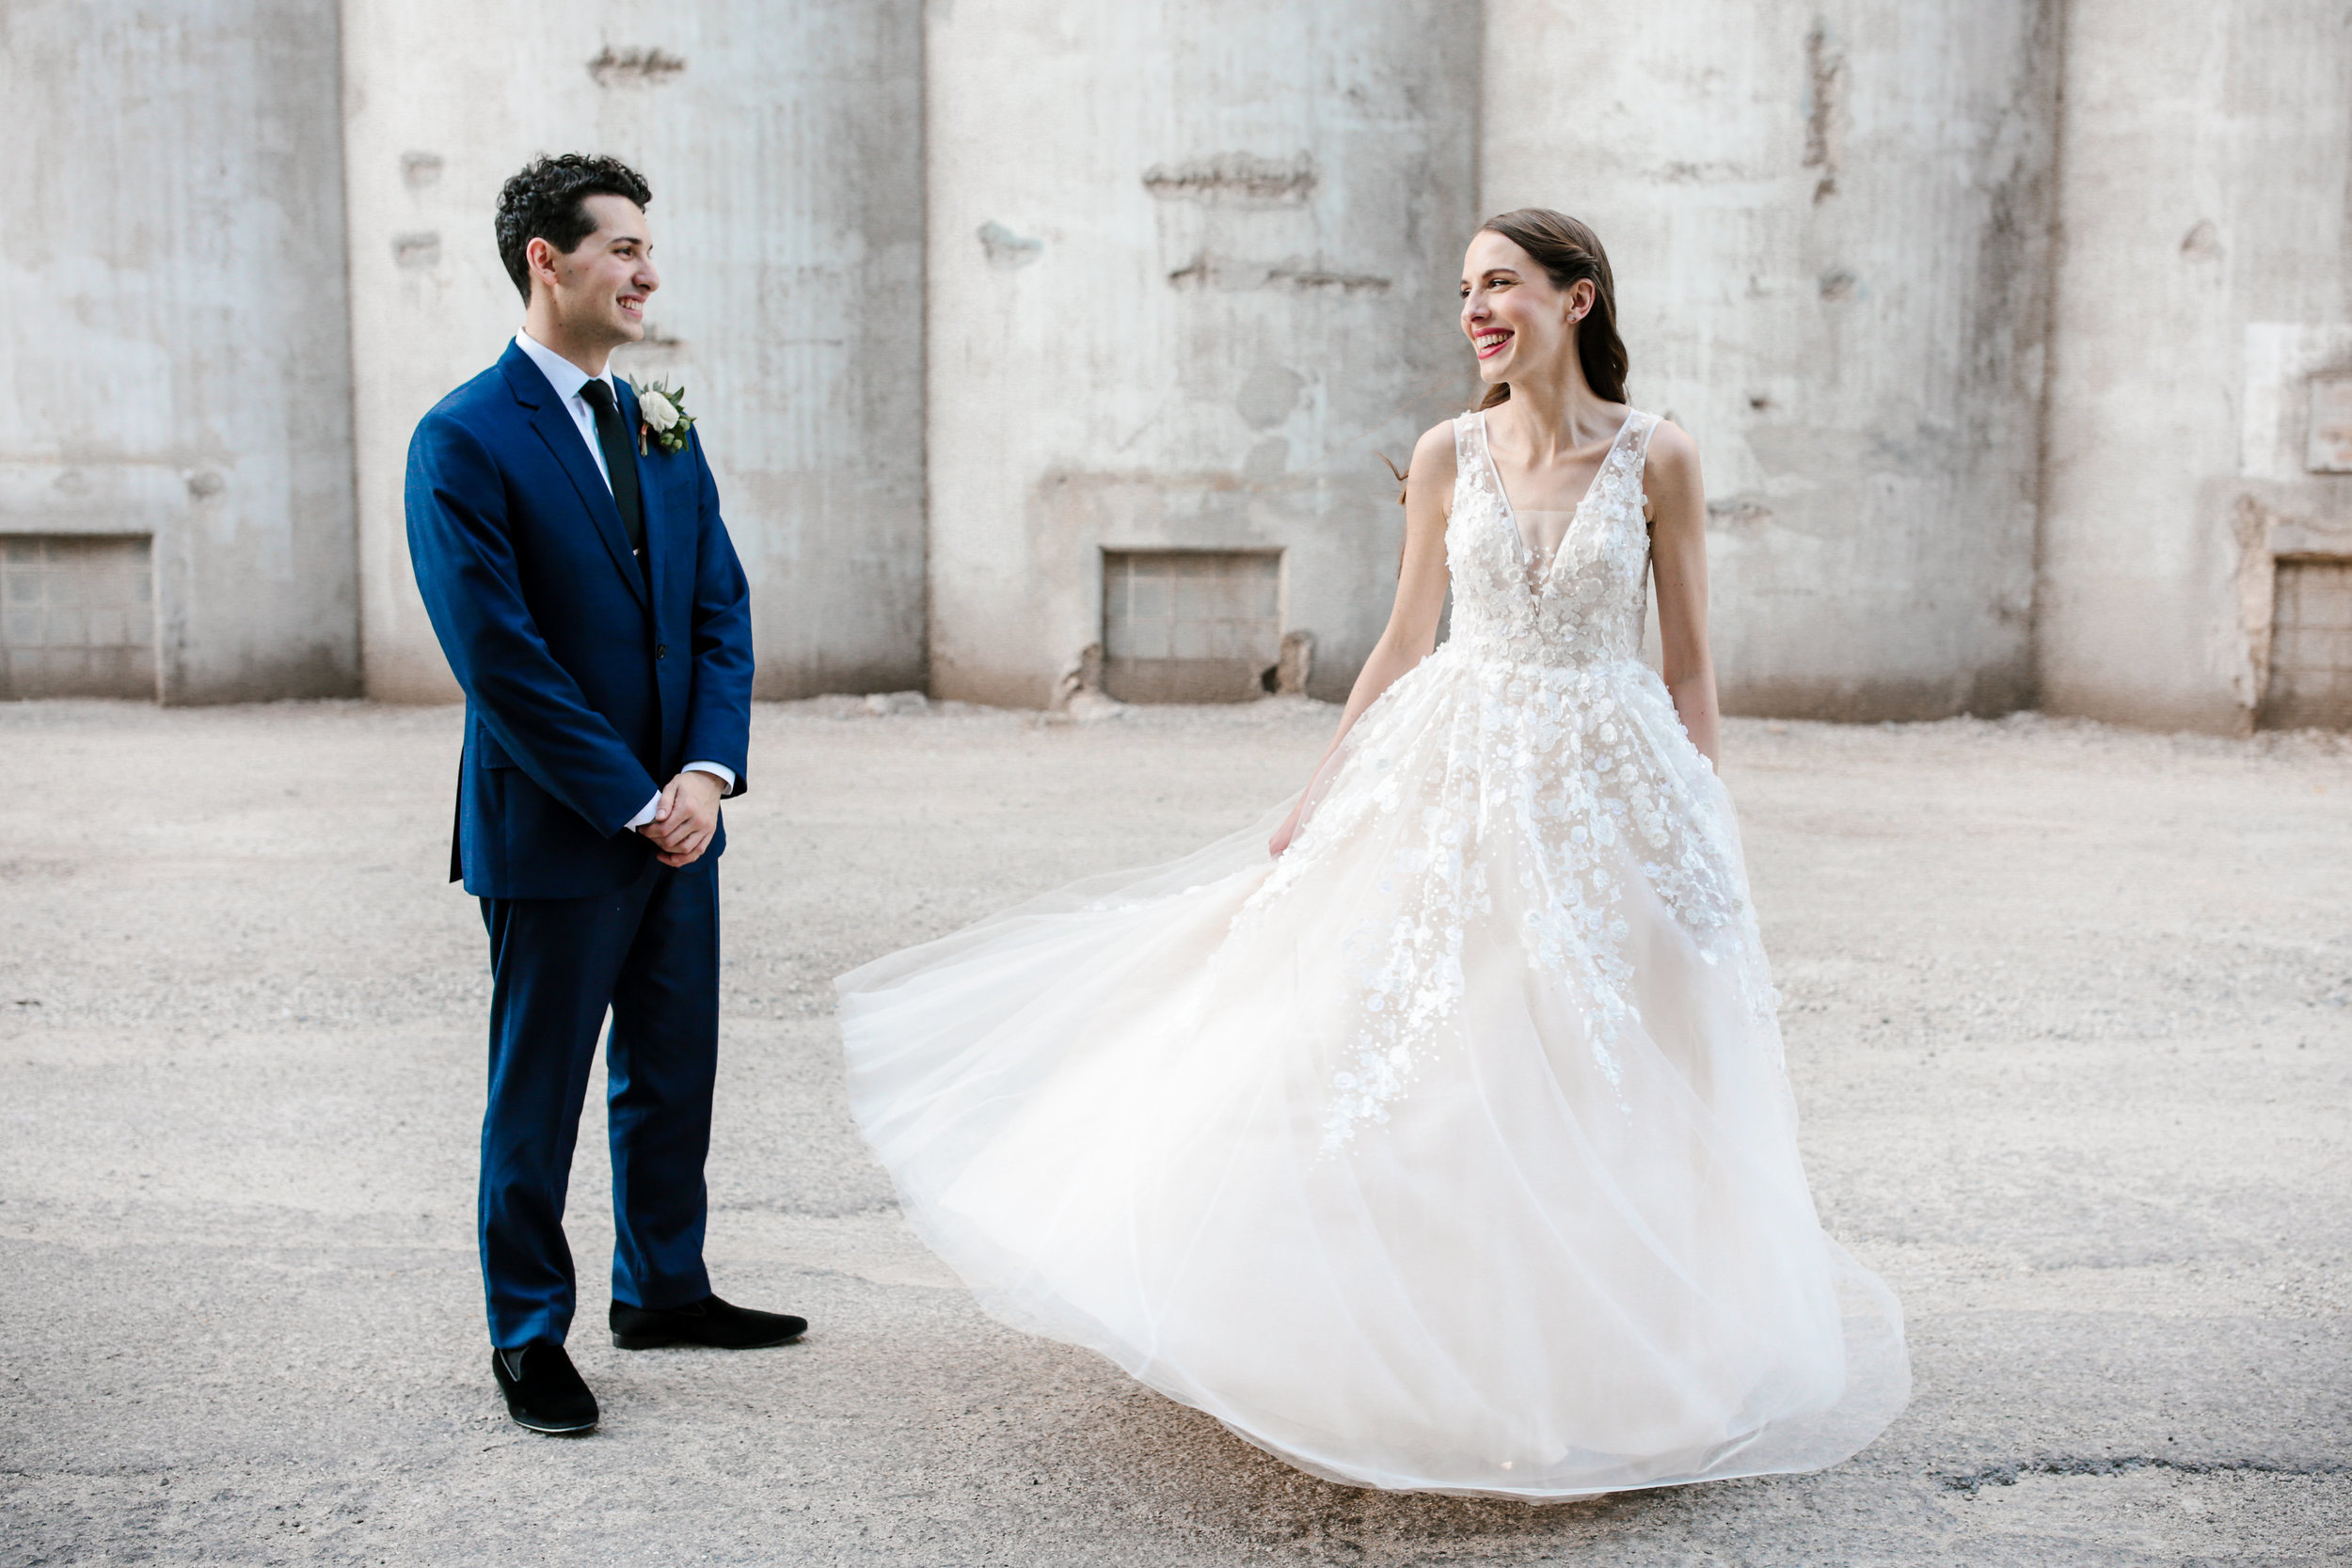 Wedding-Photo-279.jpg